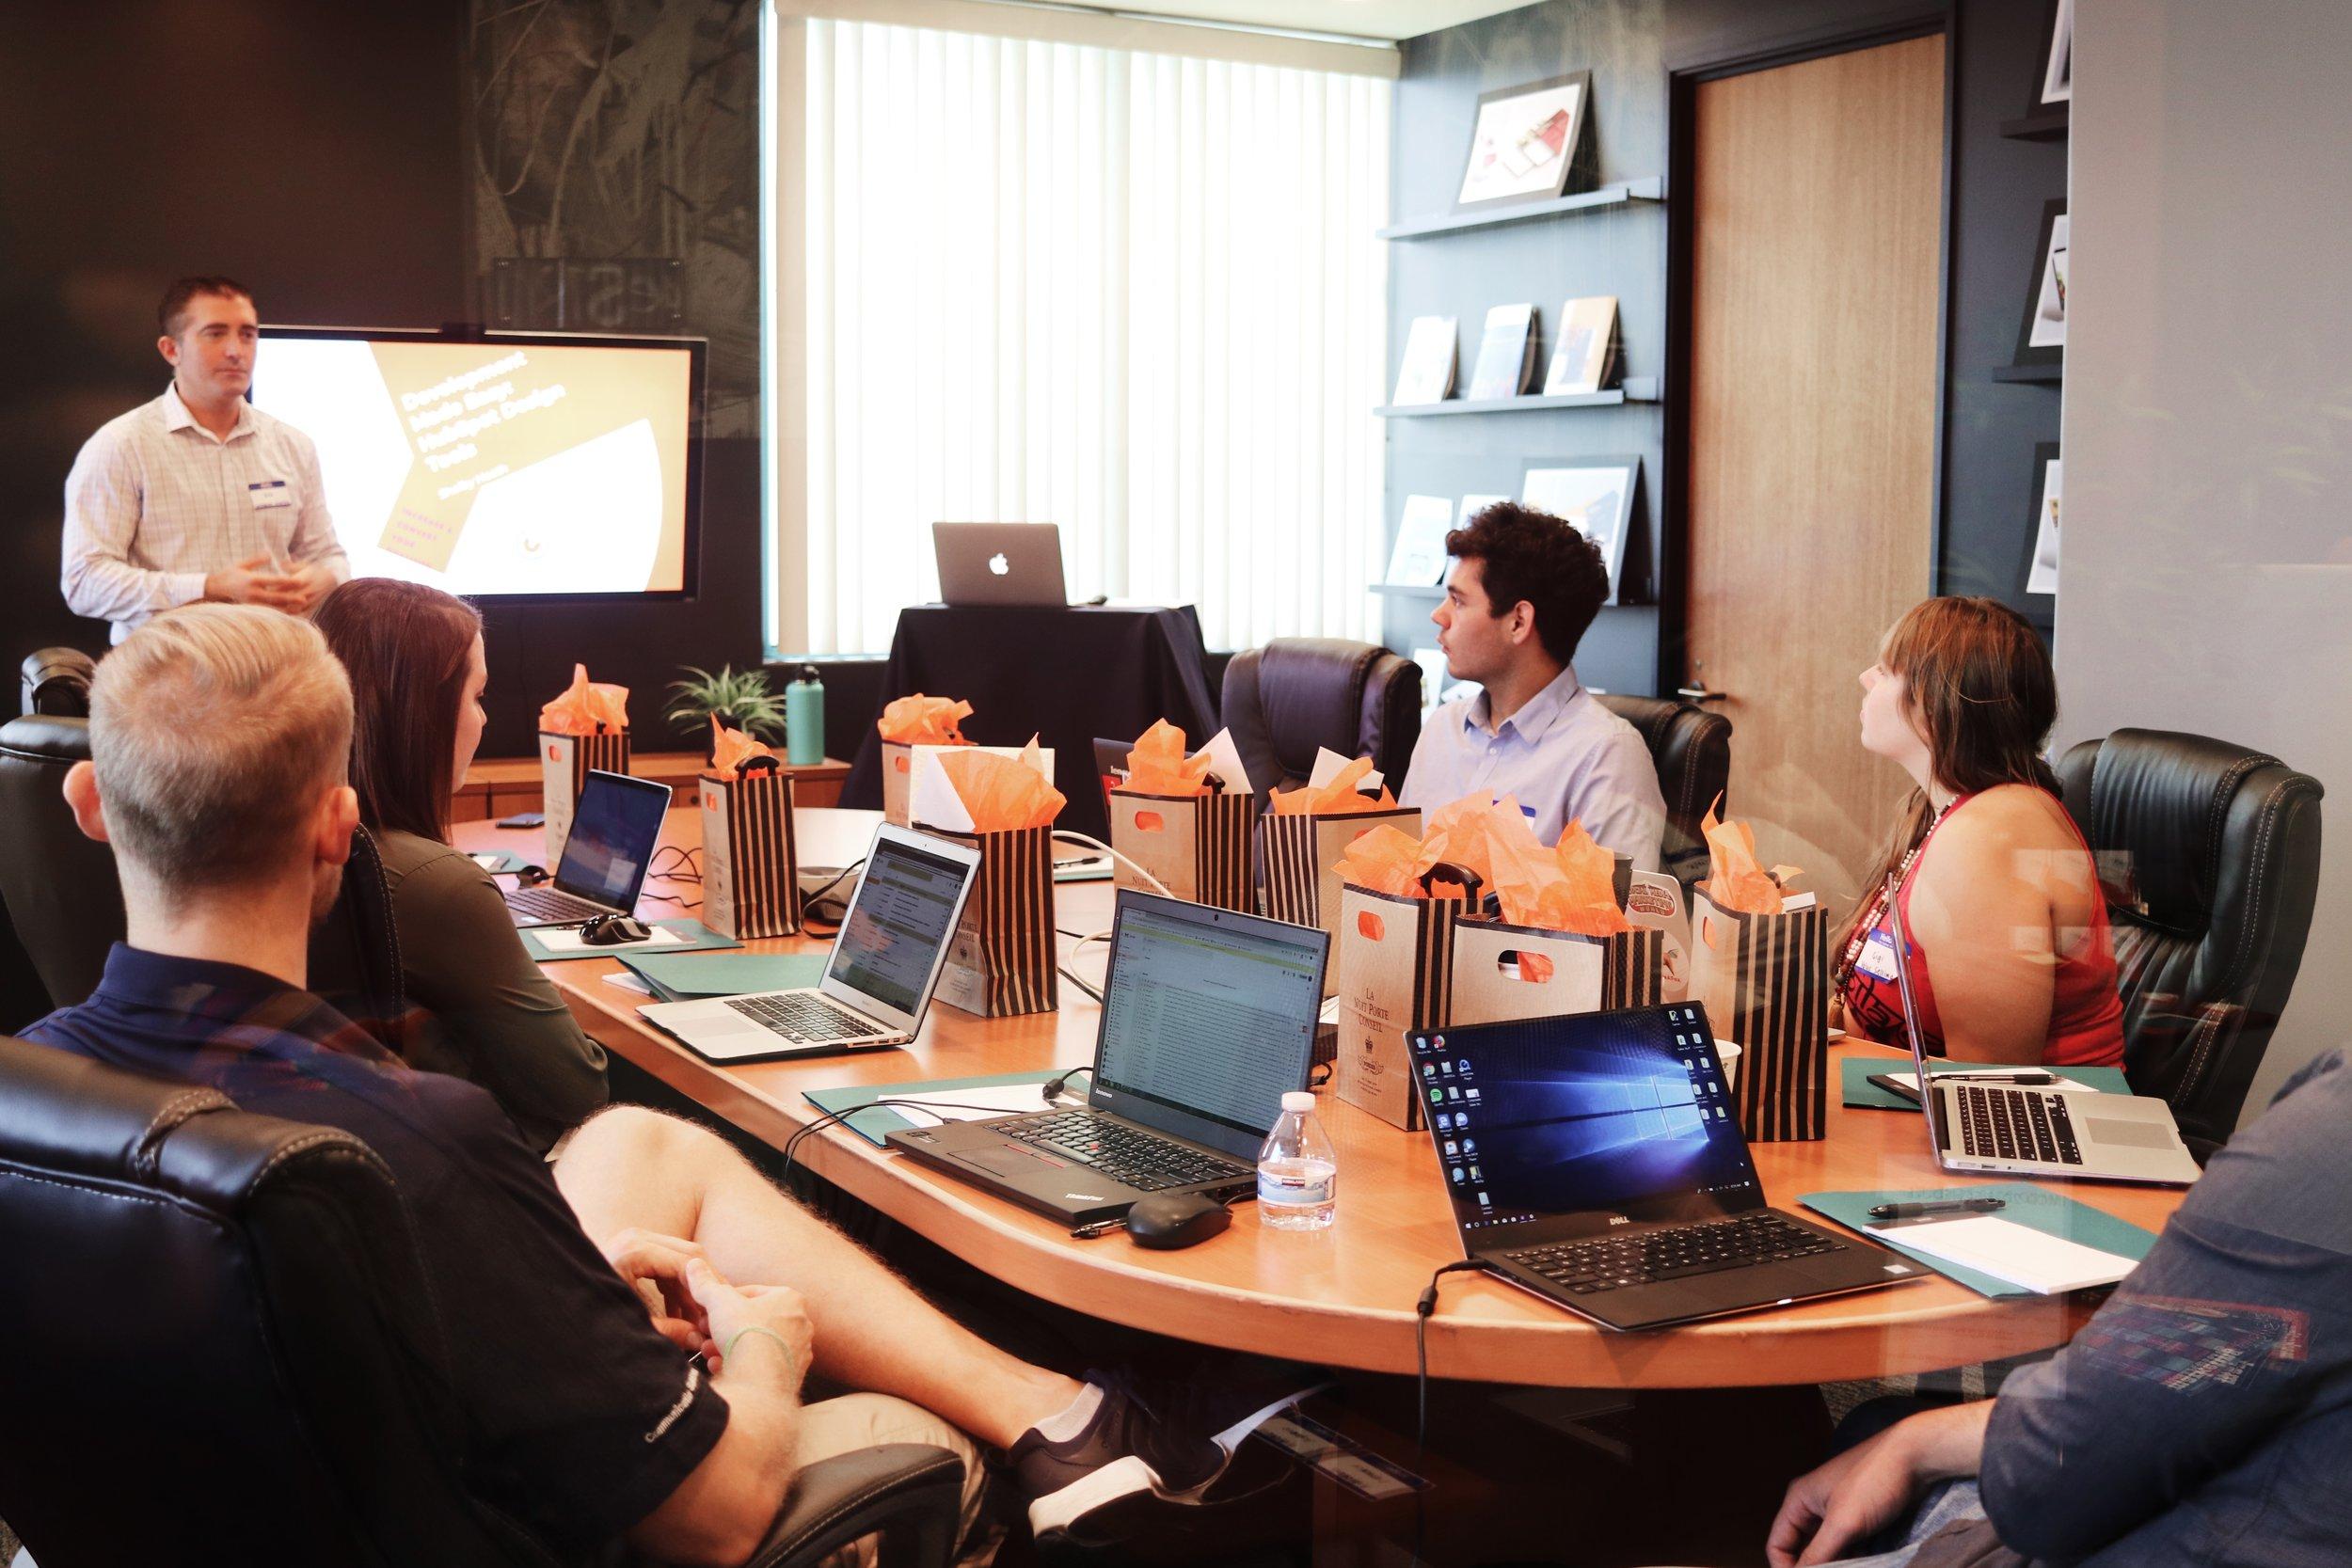 ids-ct meetings instagram event with deborah von donop of dvd interior design